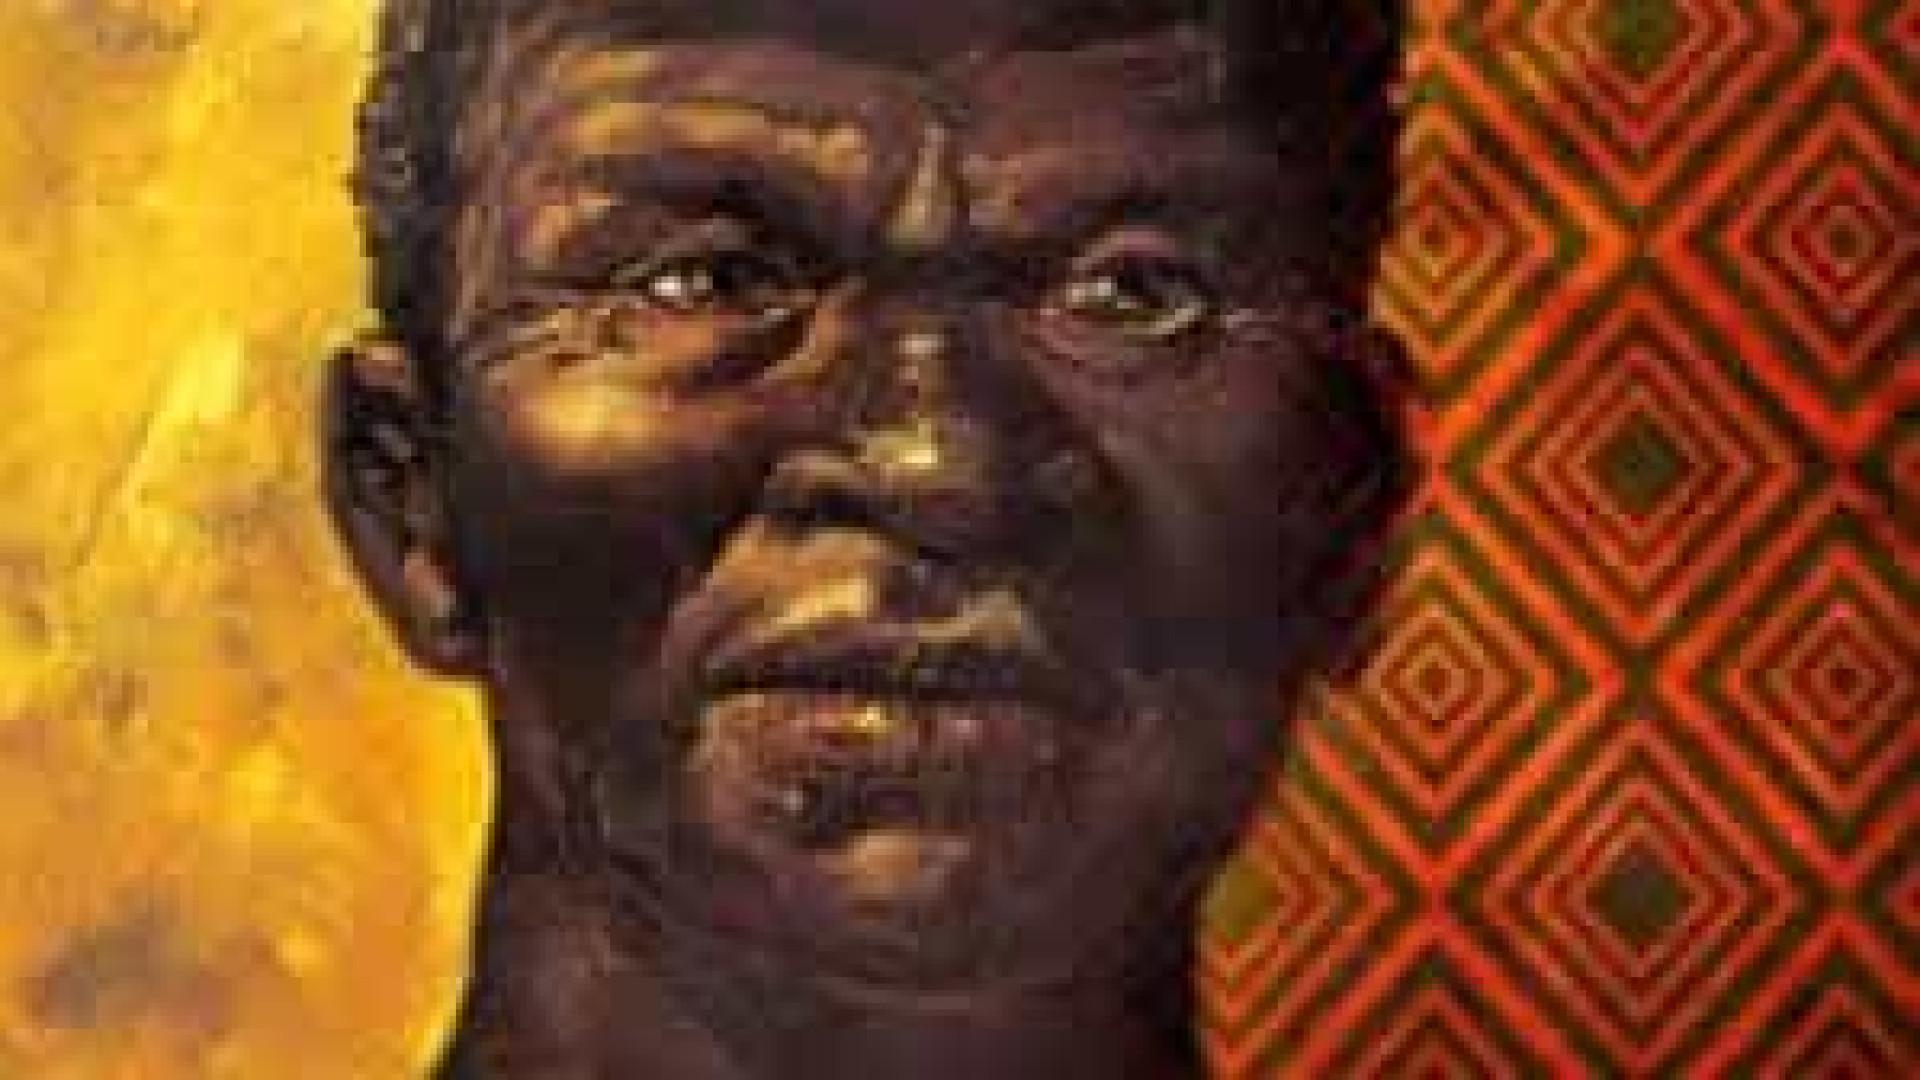 Saiba quem foi Zumbi dos Palmares, pivô da guerra cultural bolsonarista